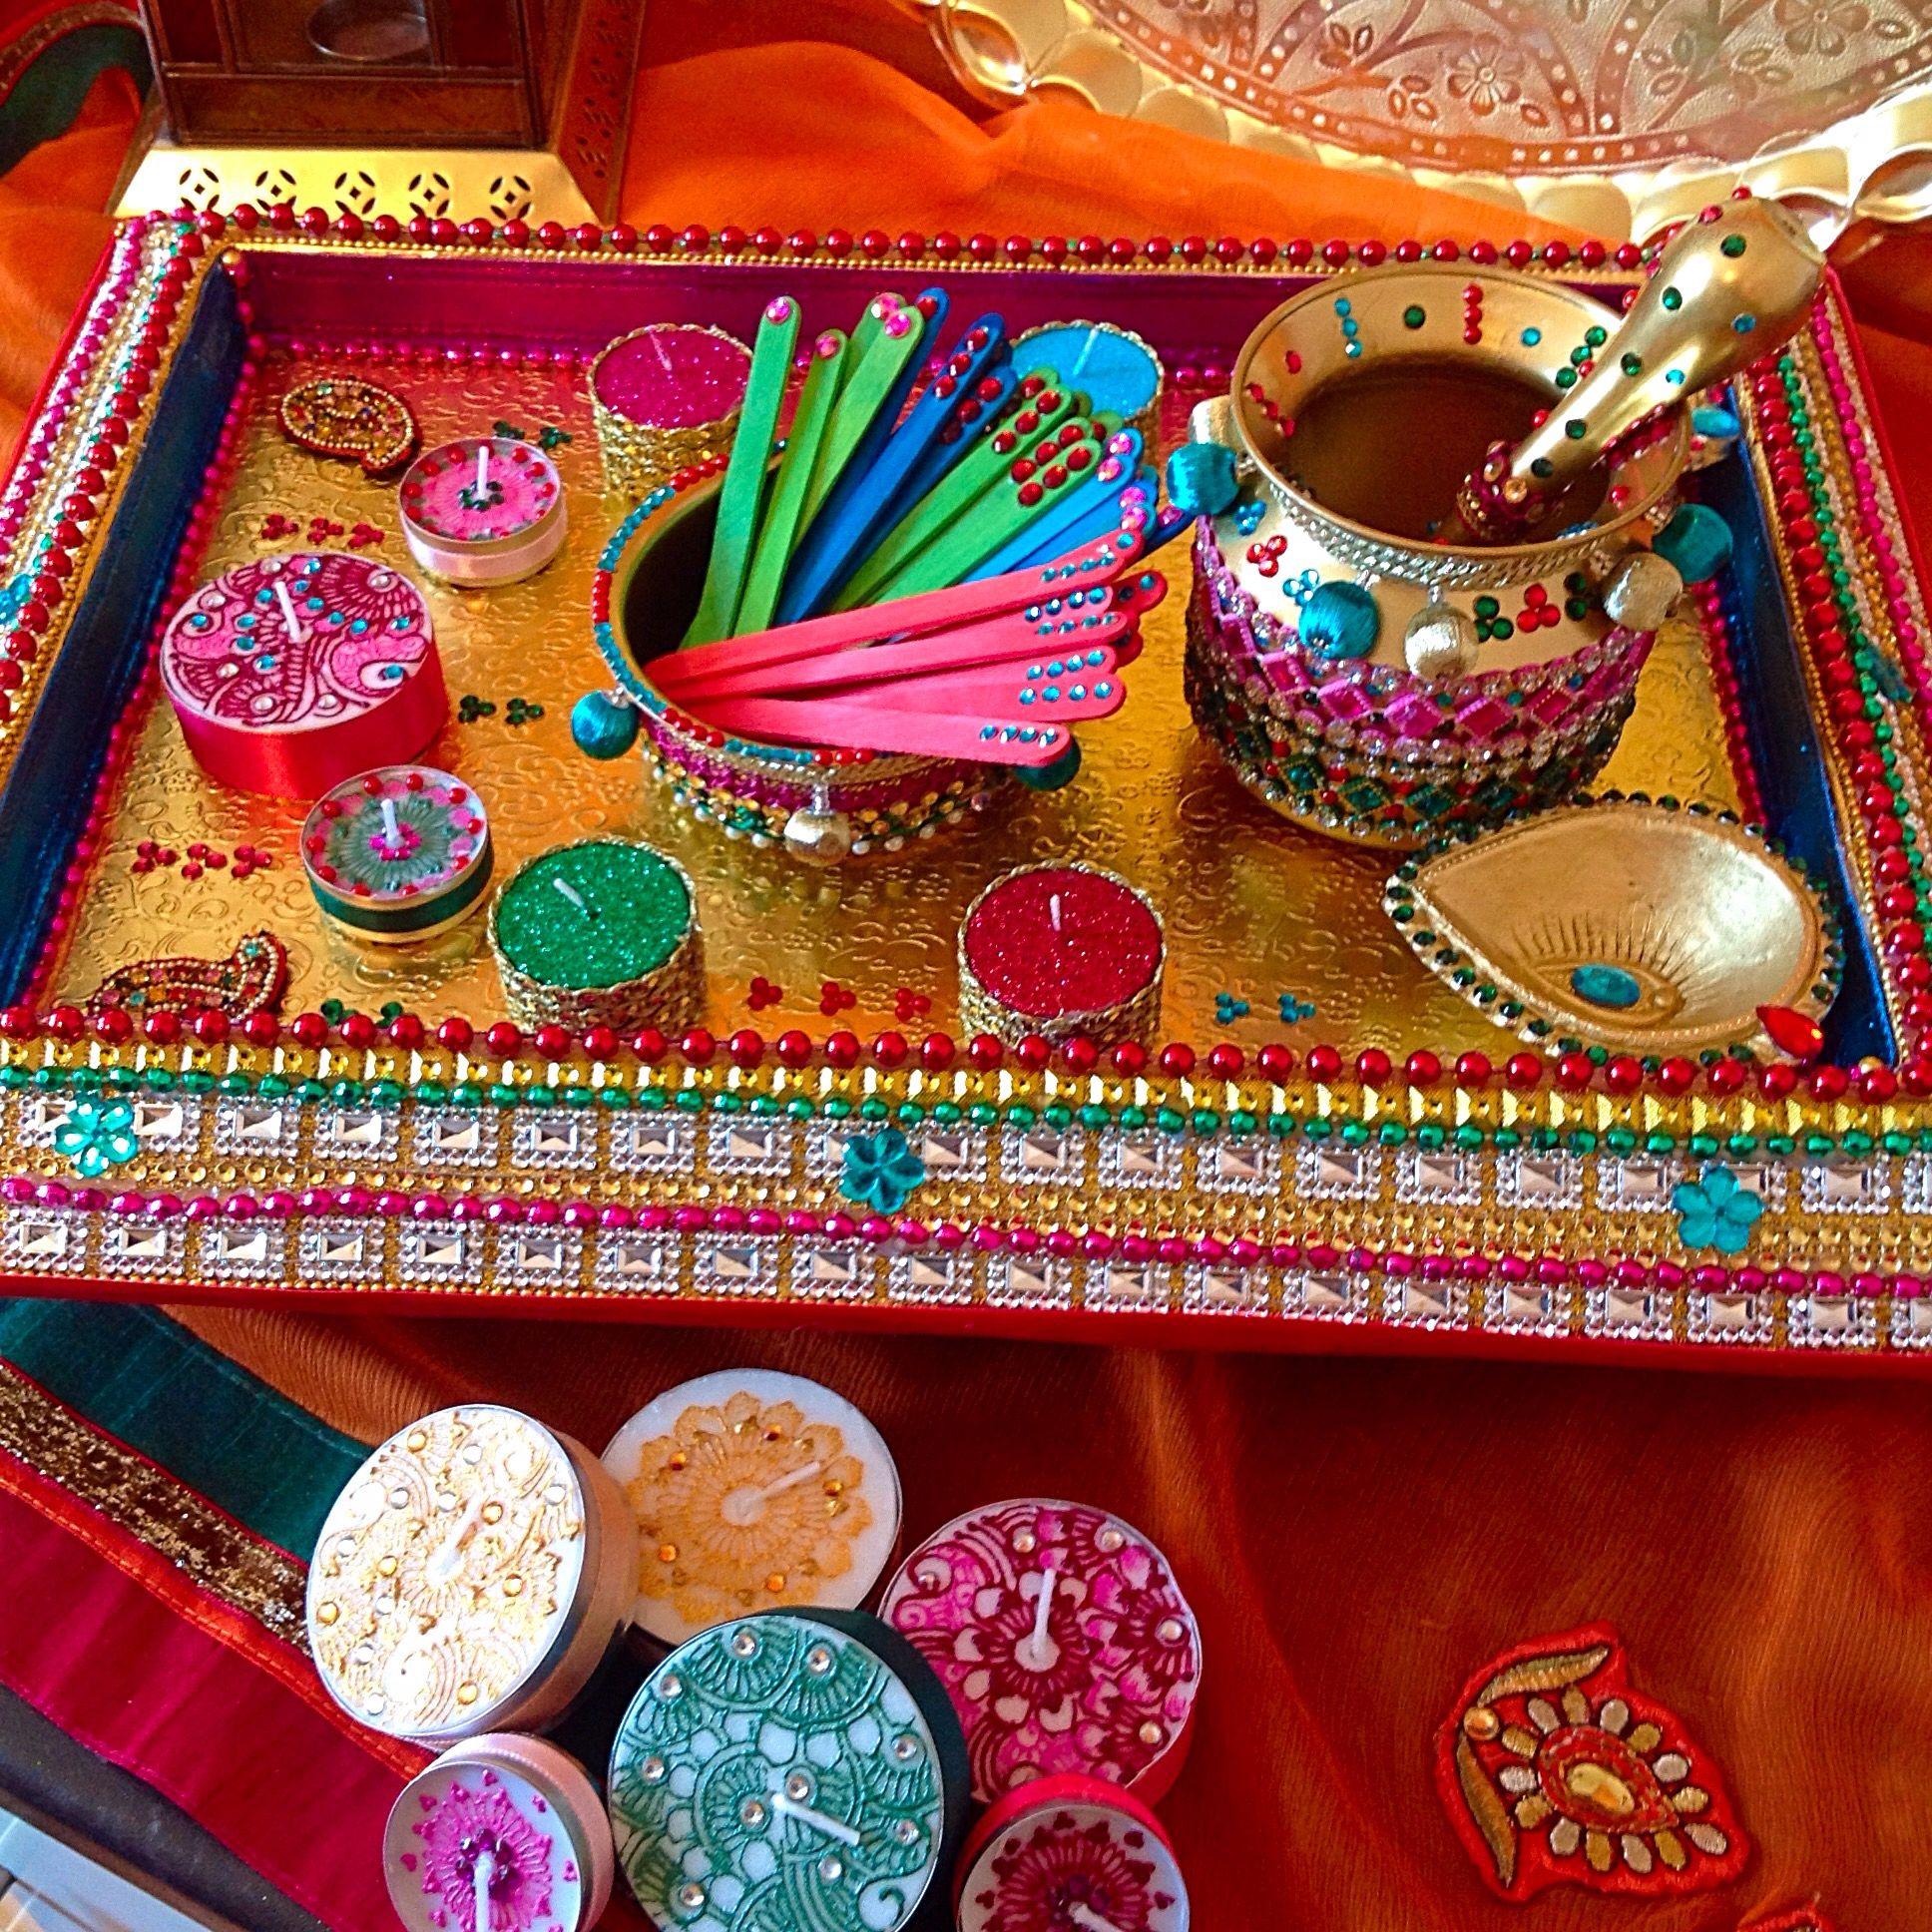 Large rectangular Mehndi plate, with matching oil and Mehndi